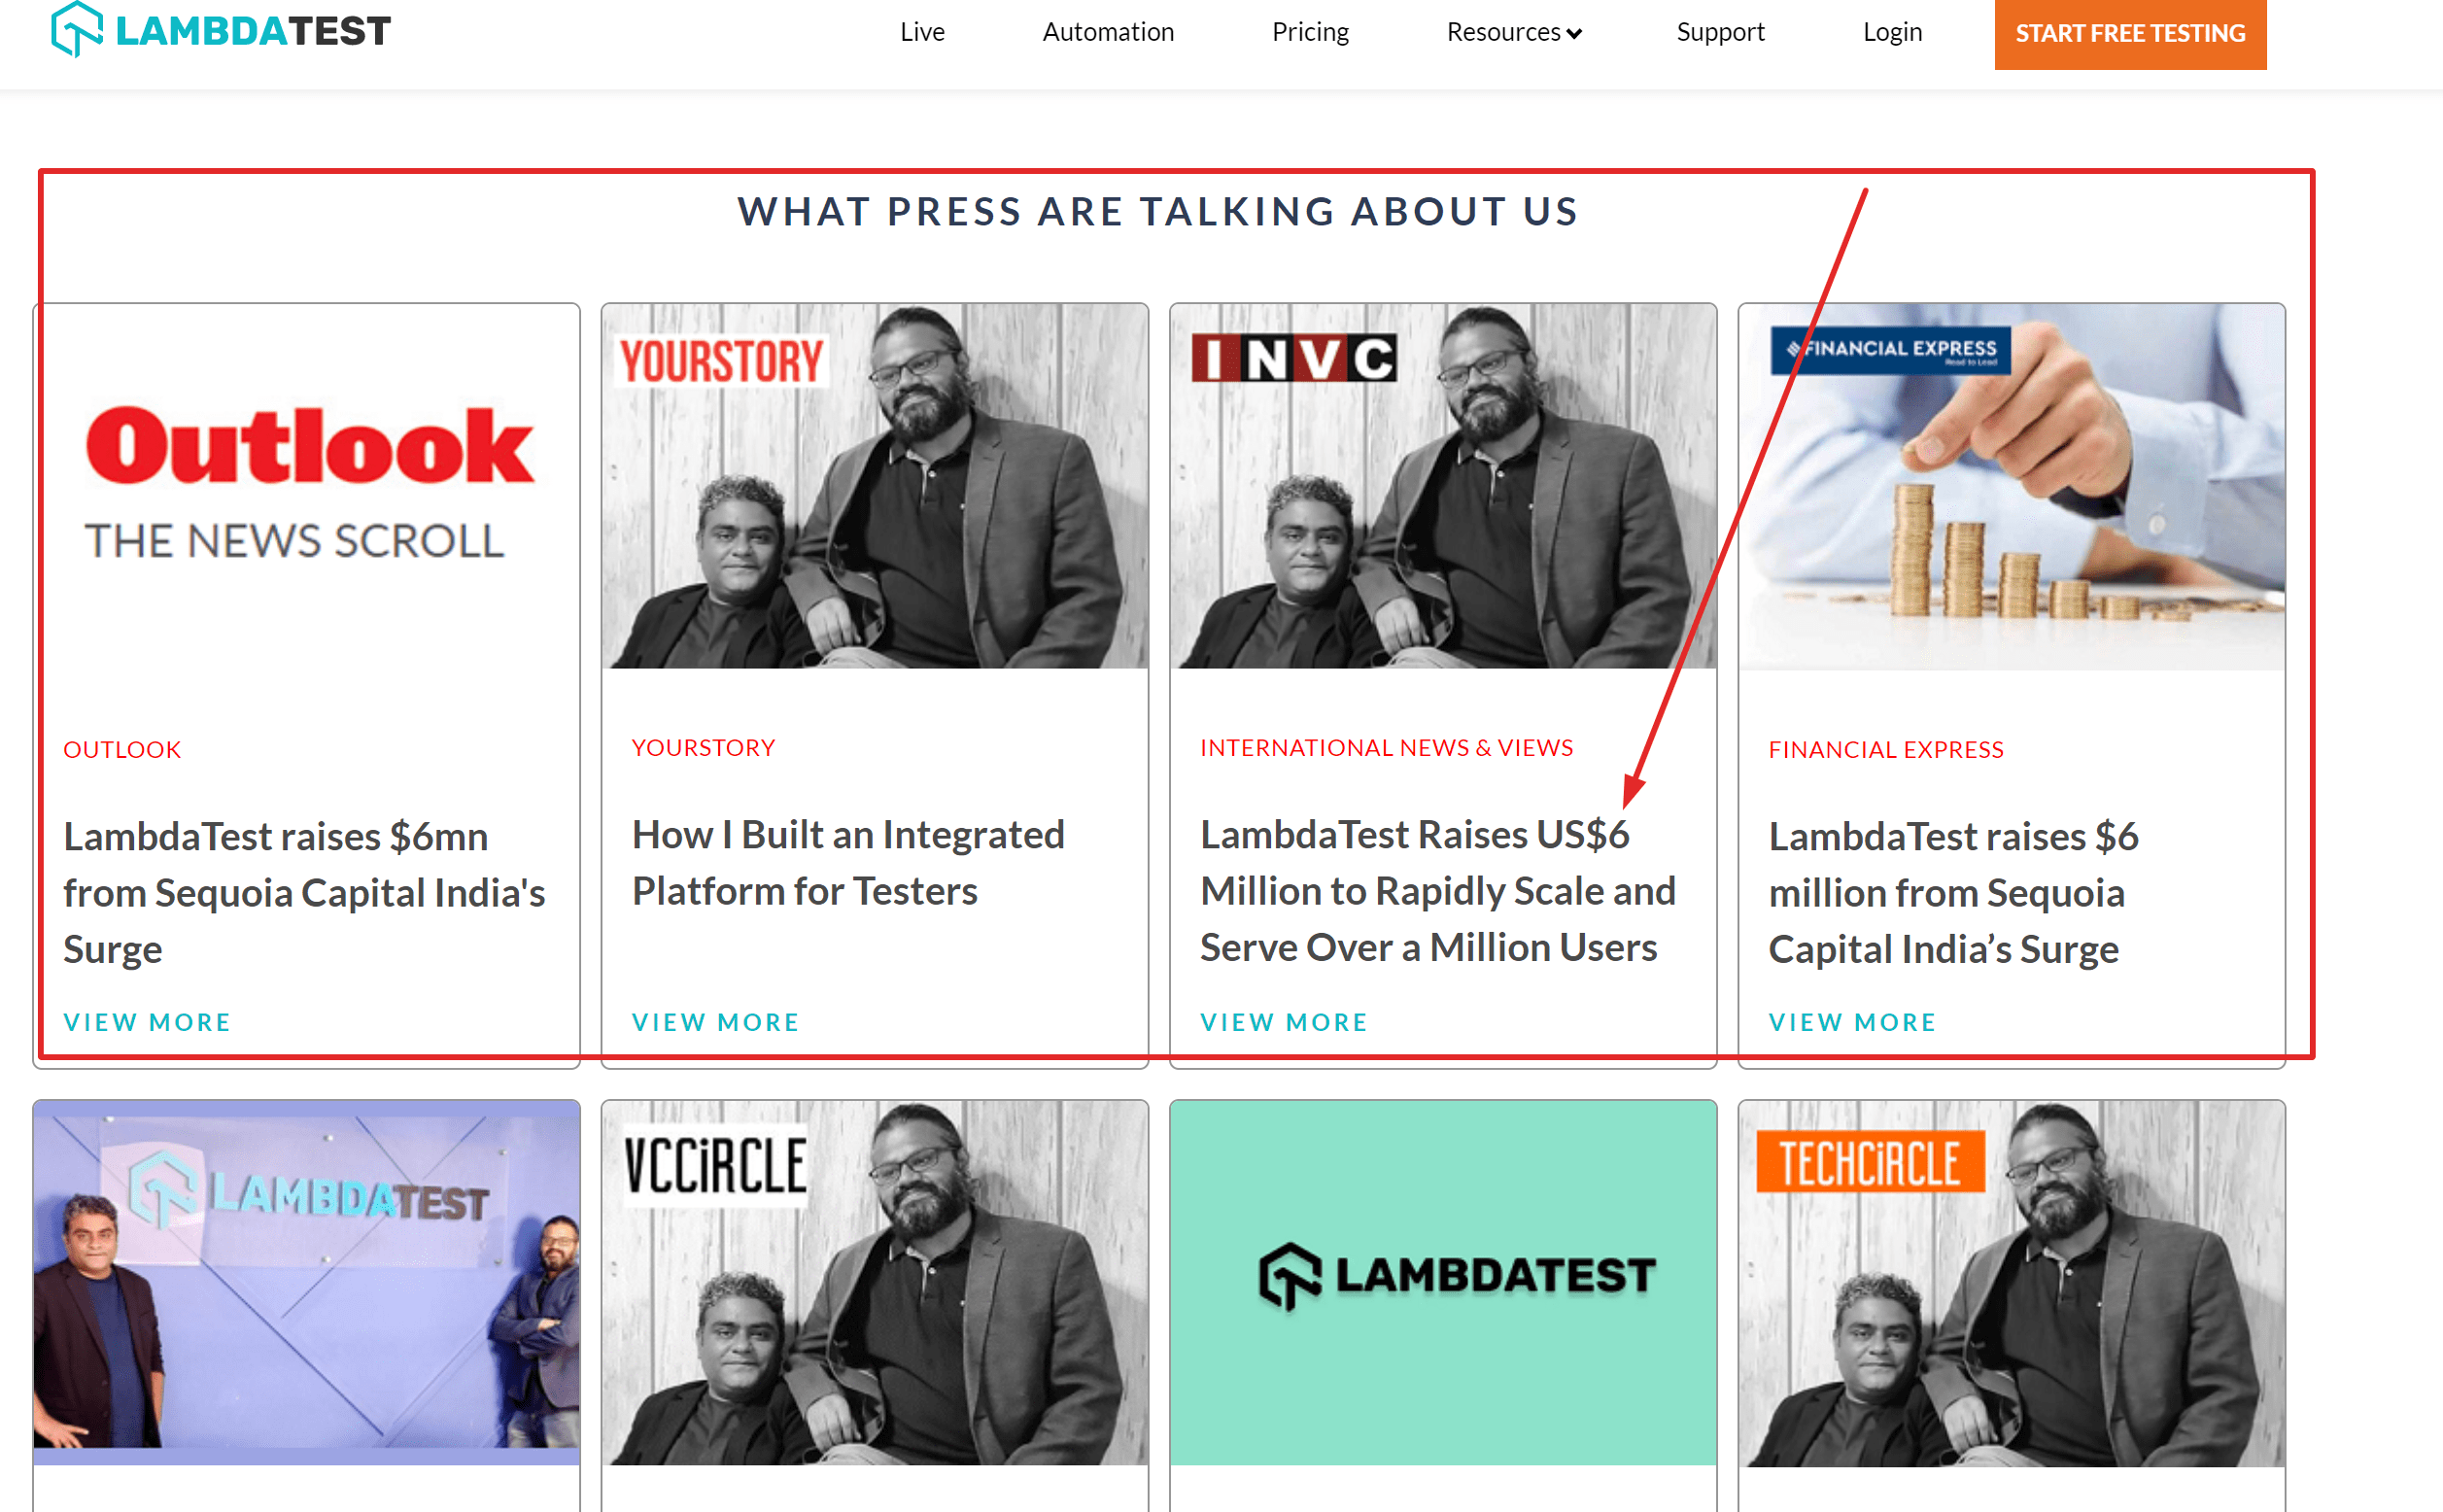 Lambdatest branding news